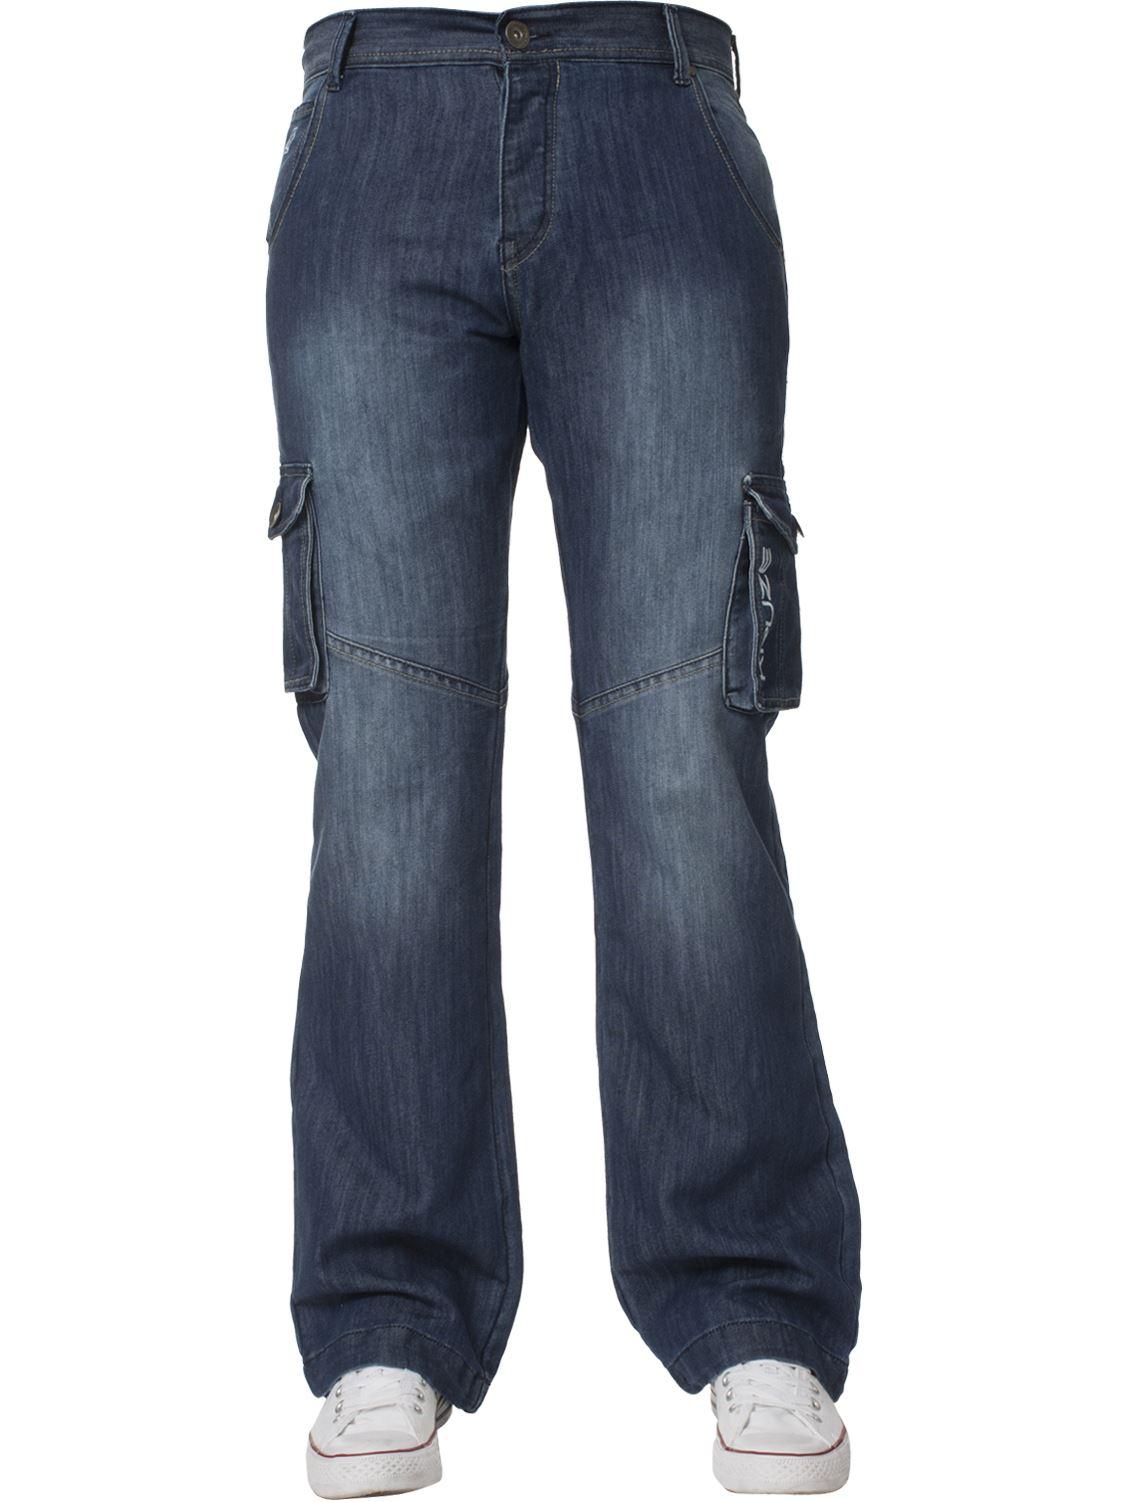 Grandes-jeans-para-hombre-de-combate-de-Kruze-Rey-Alto-Pierna-Cargo-Pantalones-Jeans-Pantalones miniatura 3